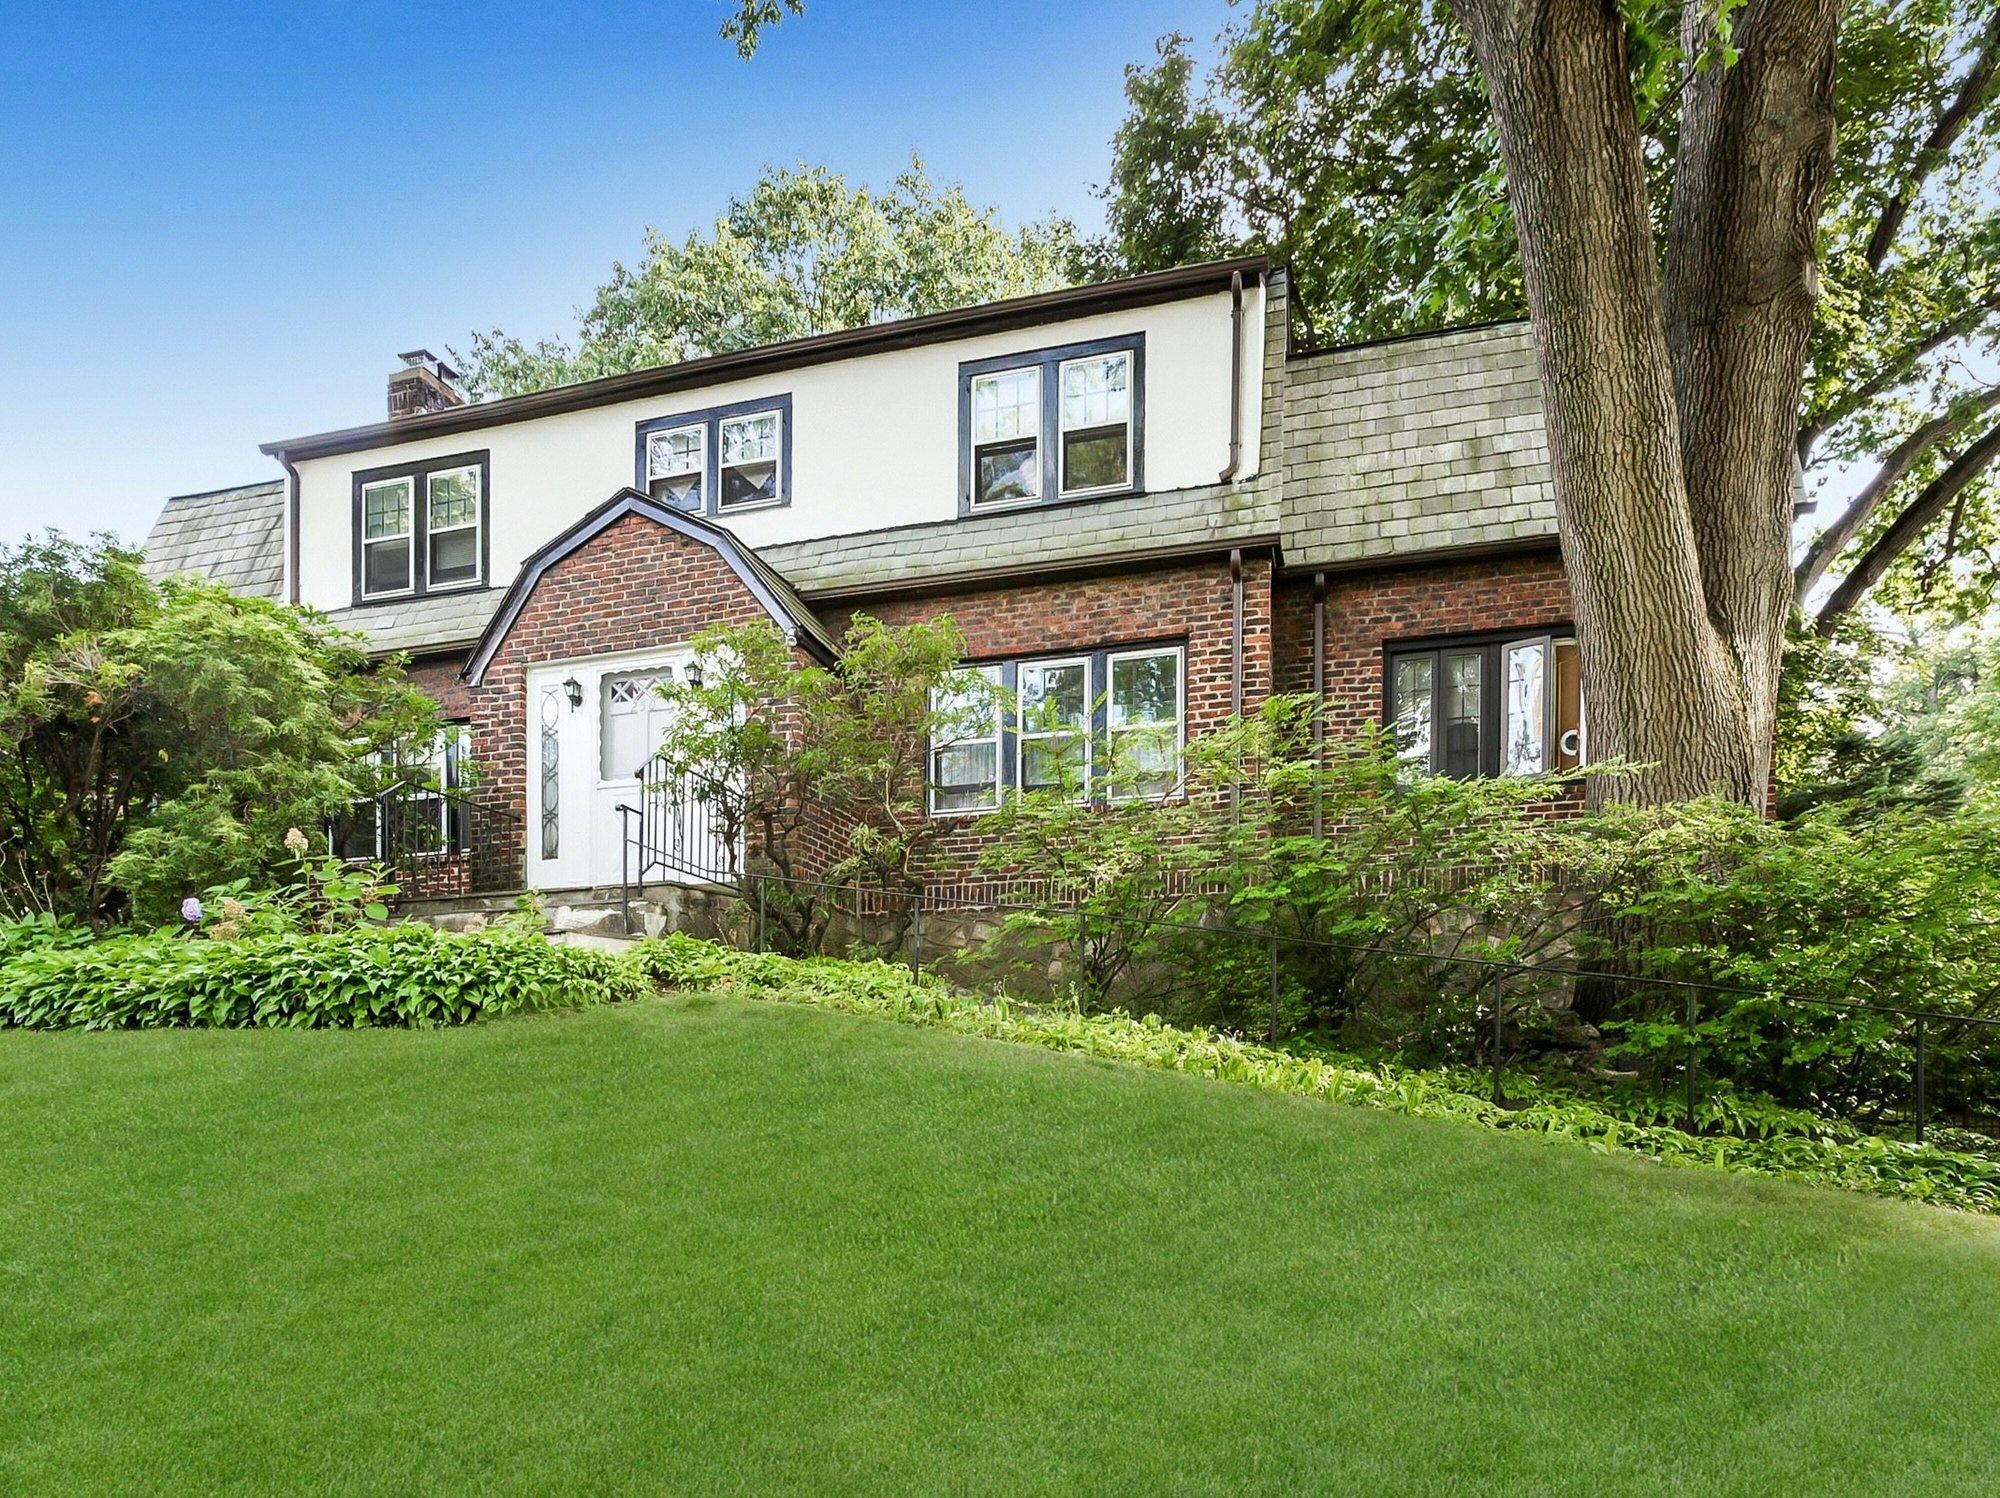 House in Village of Pelham, New York, United States 1